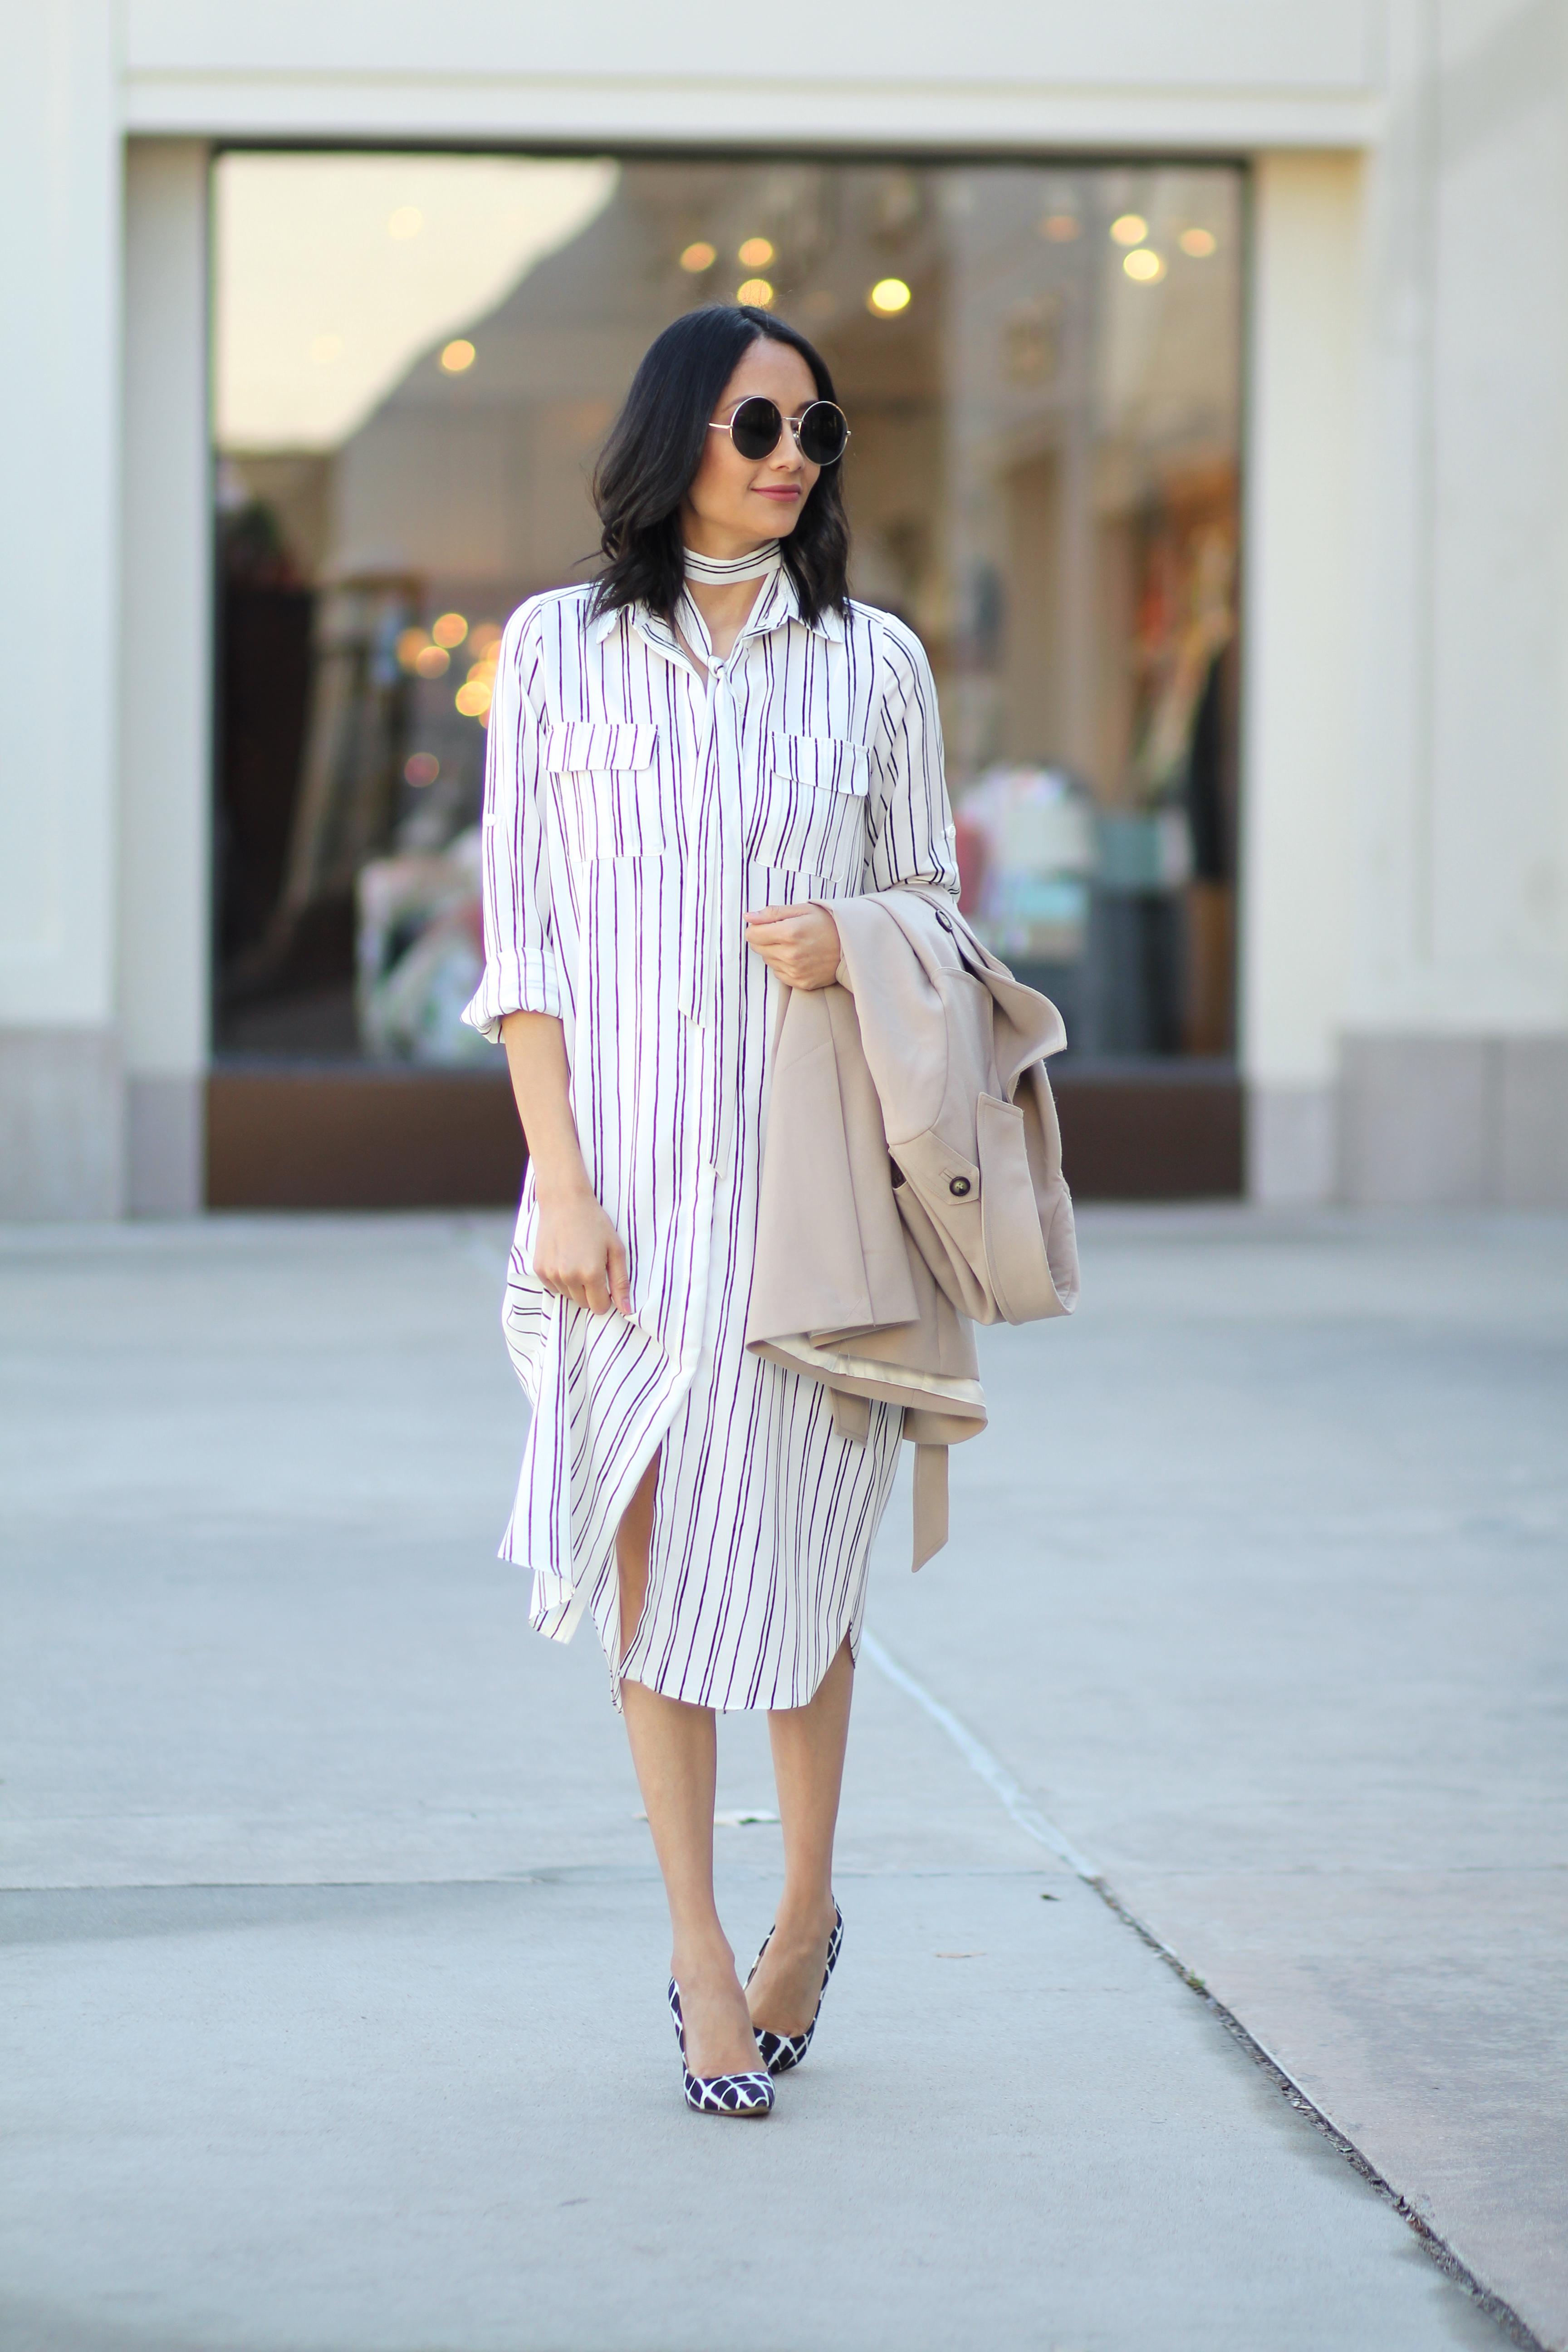 Pinstripe dress outfit idea